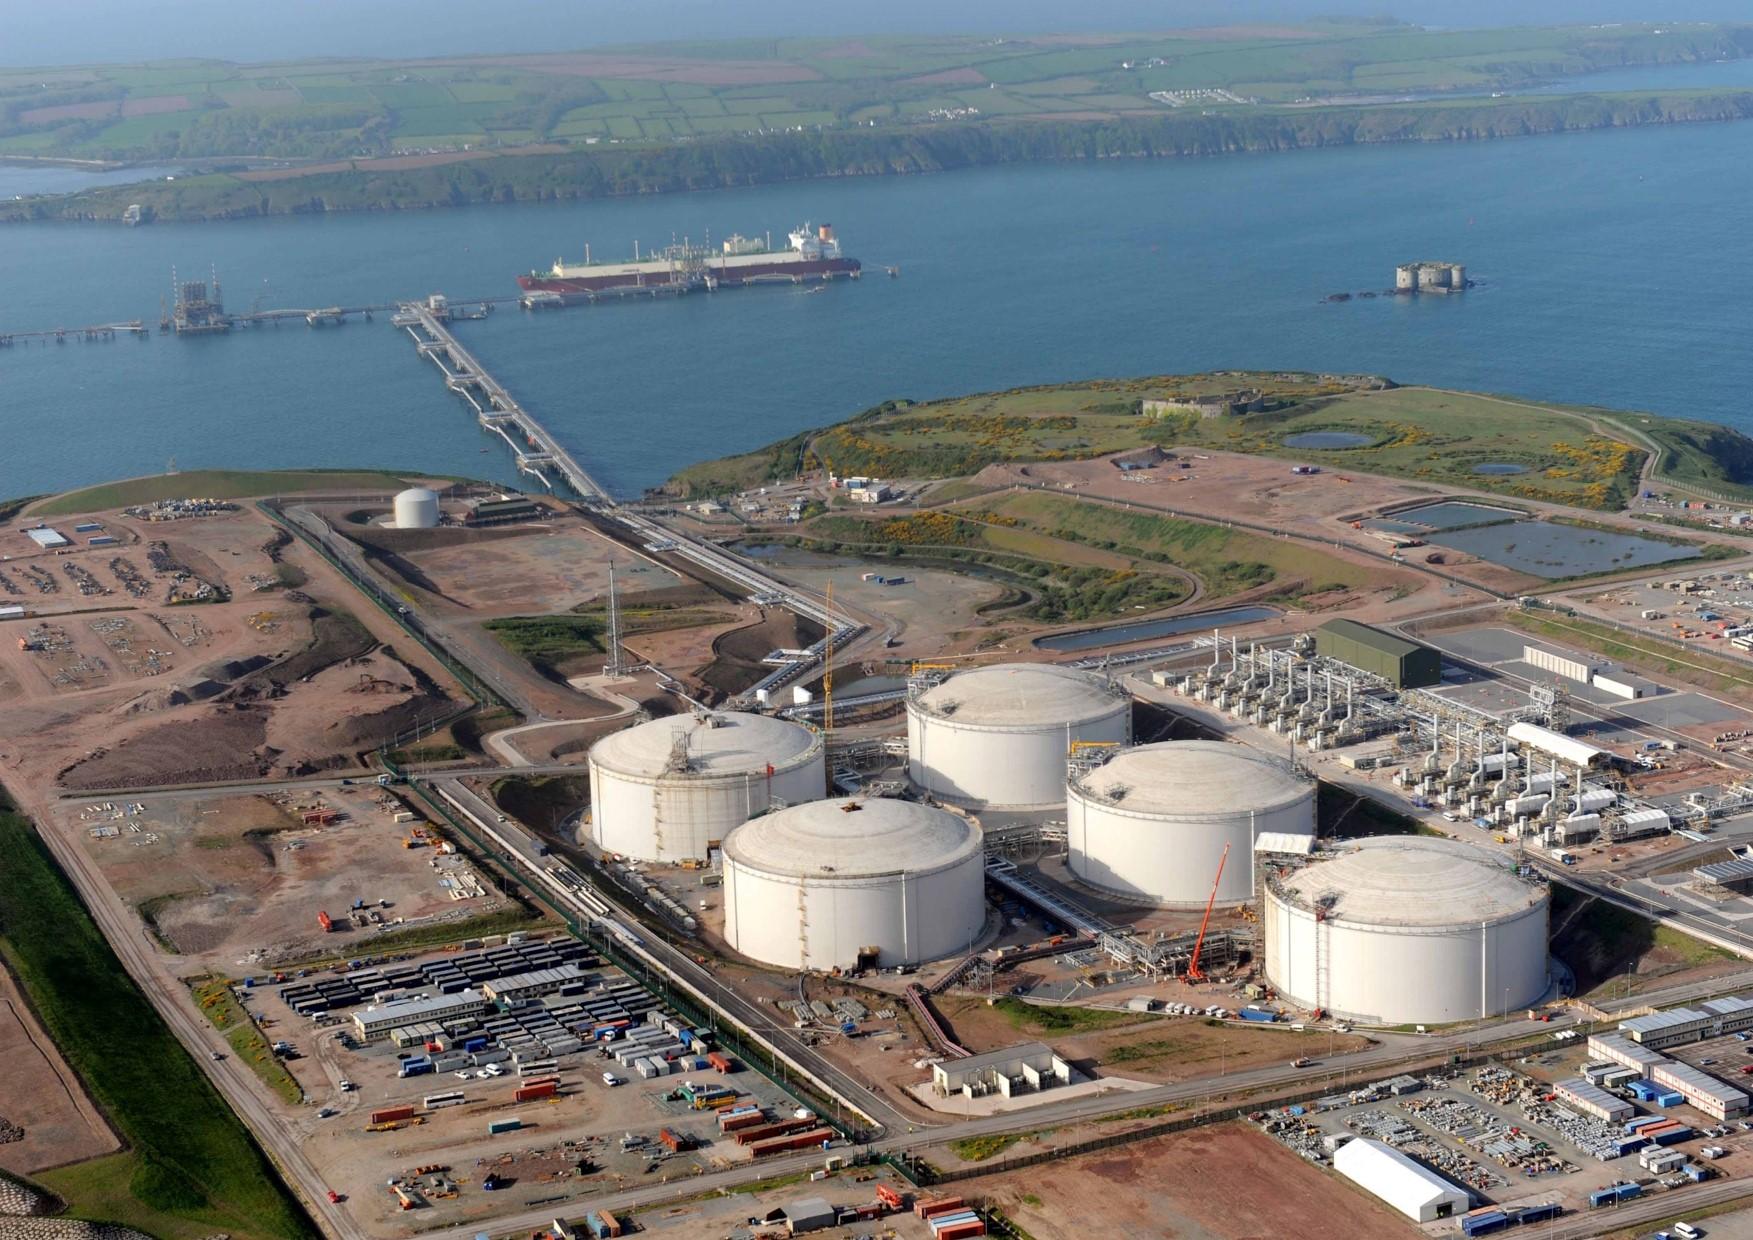 Qatari LNG cargoes heading for UK